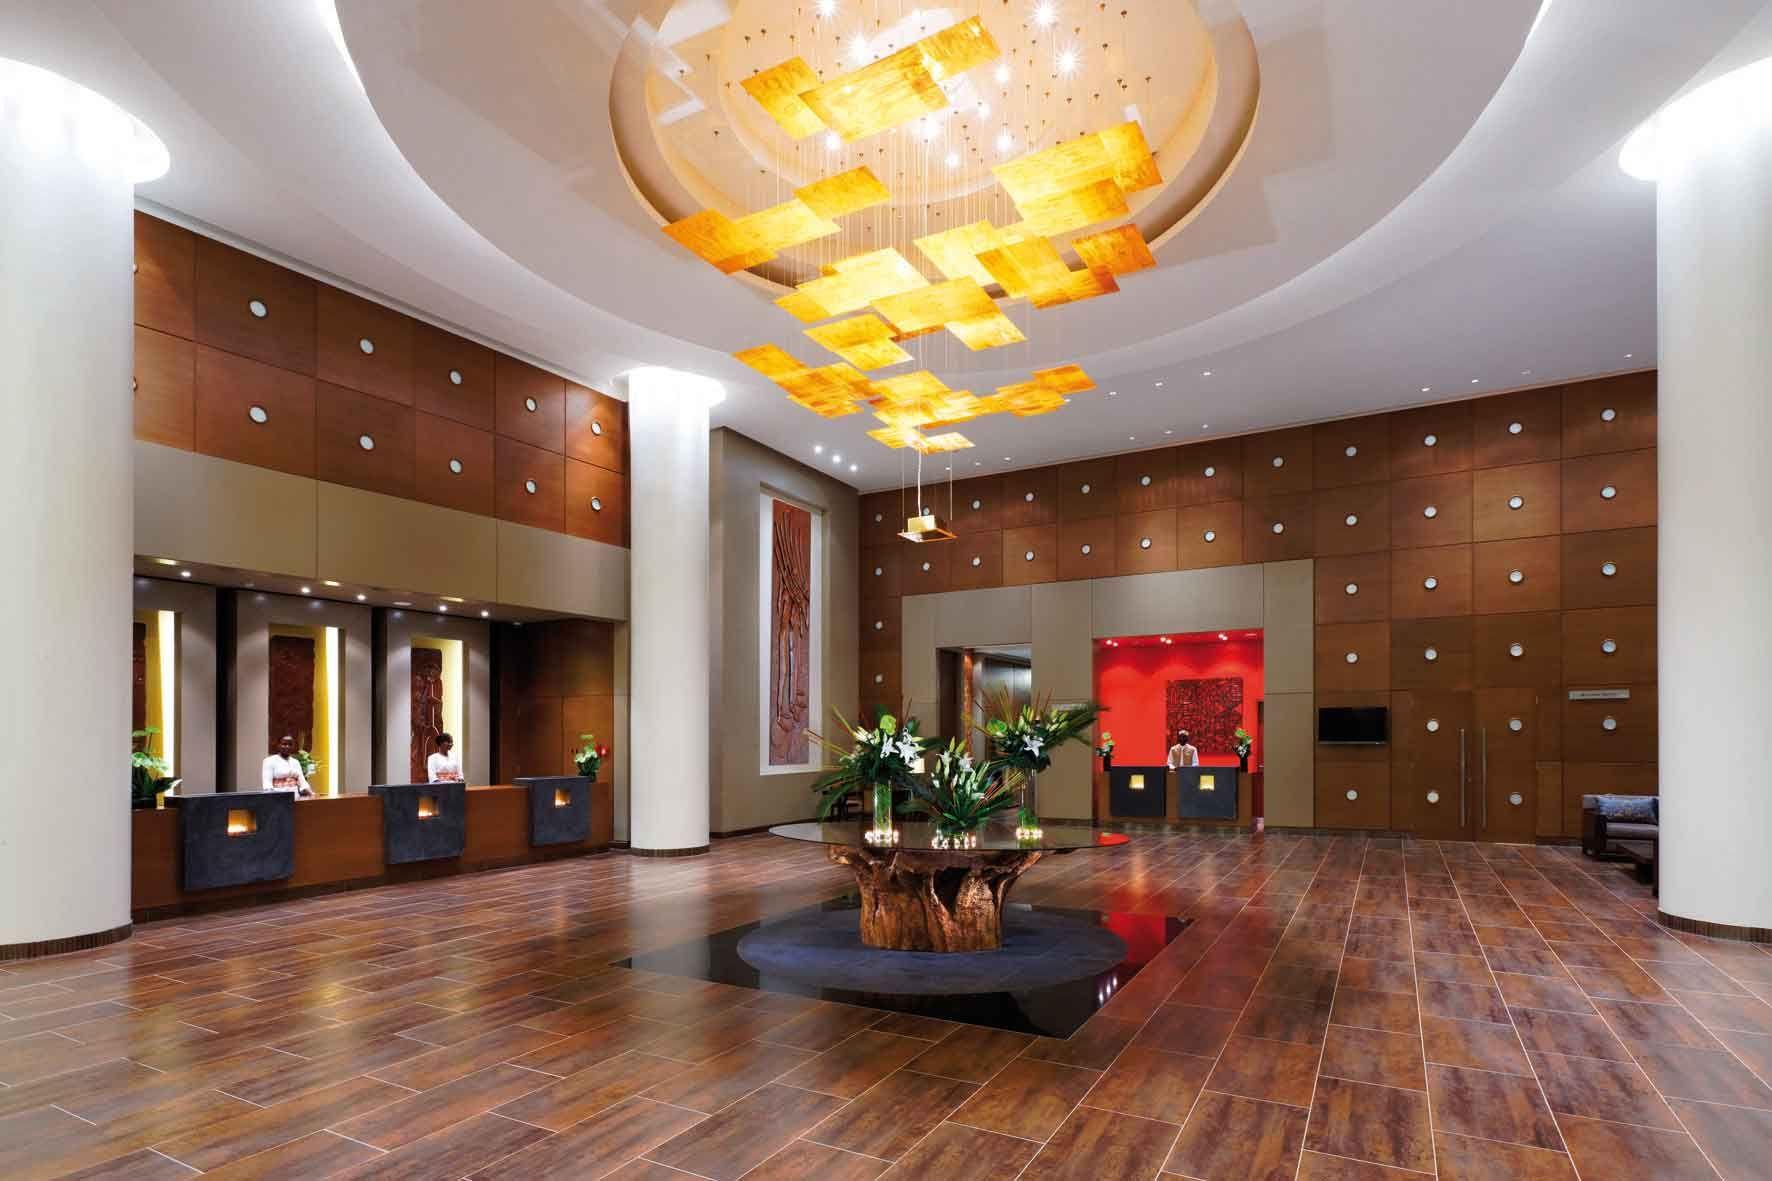 Ambassador Hotel Accra-Ghana